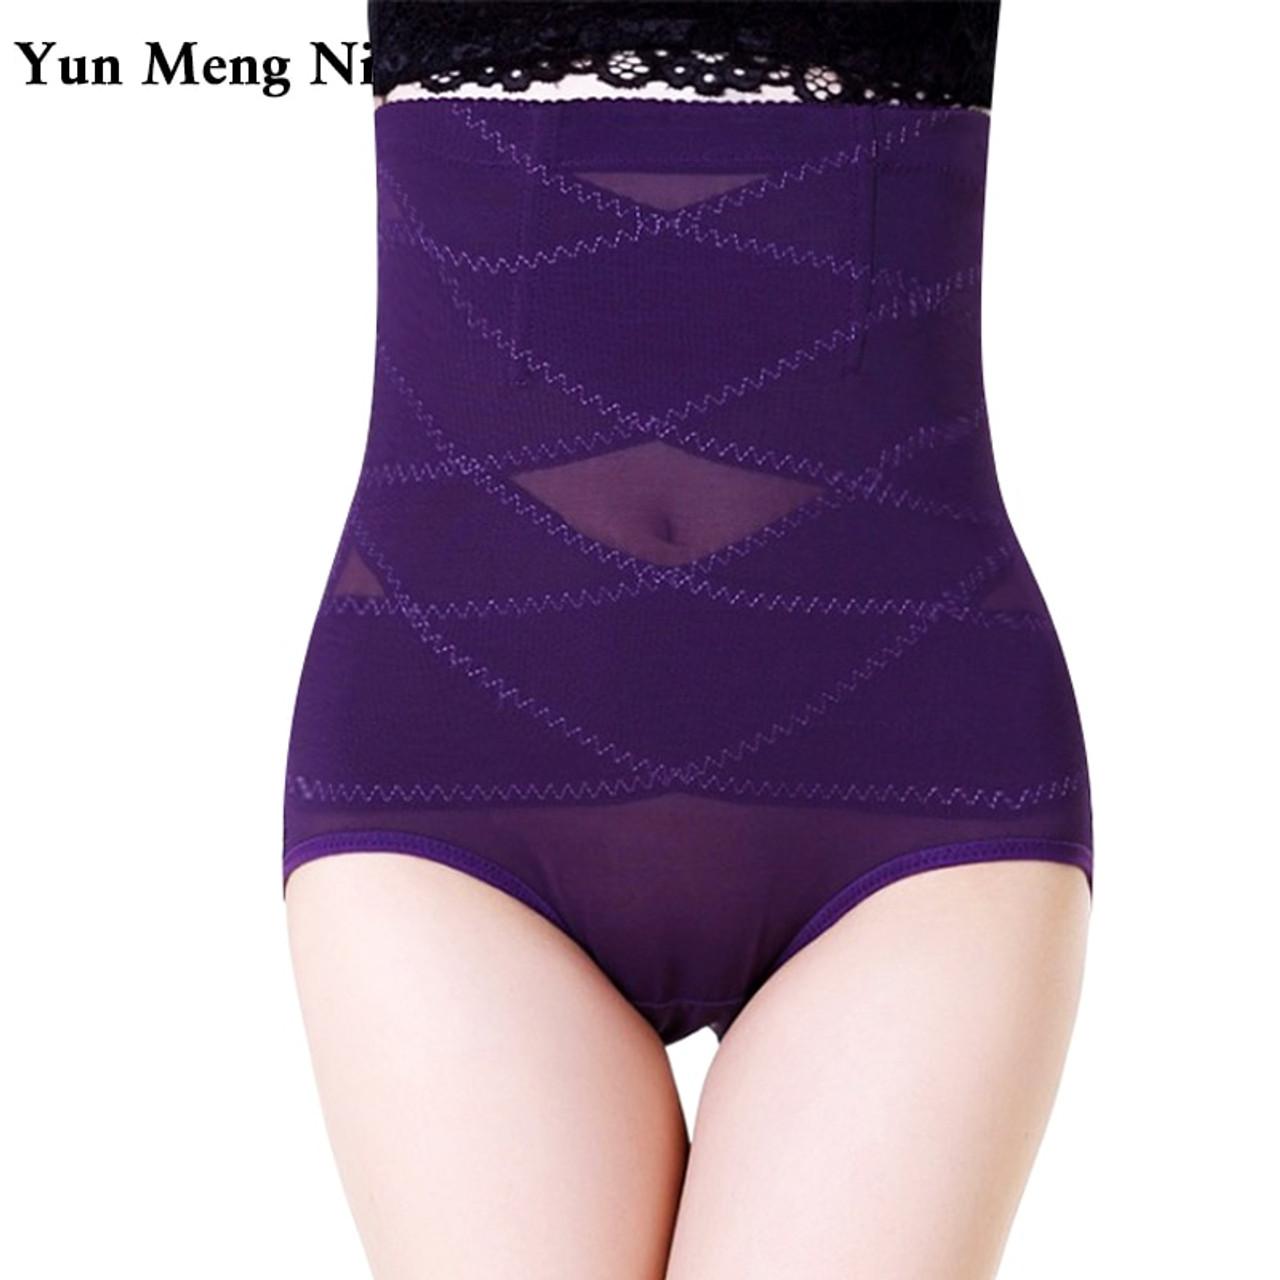 48e0cb7ea Hot Sale S-4XL Plus Size Slimming High Waist Abdomen Control Underwear  Women Shapewear Clothing ...